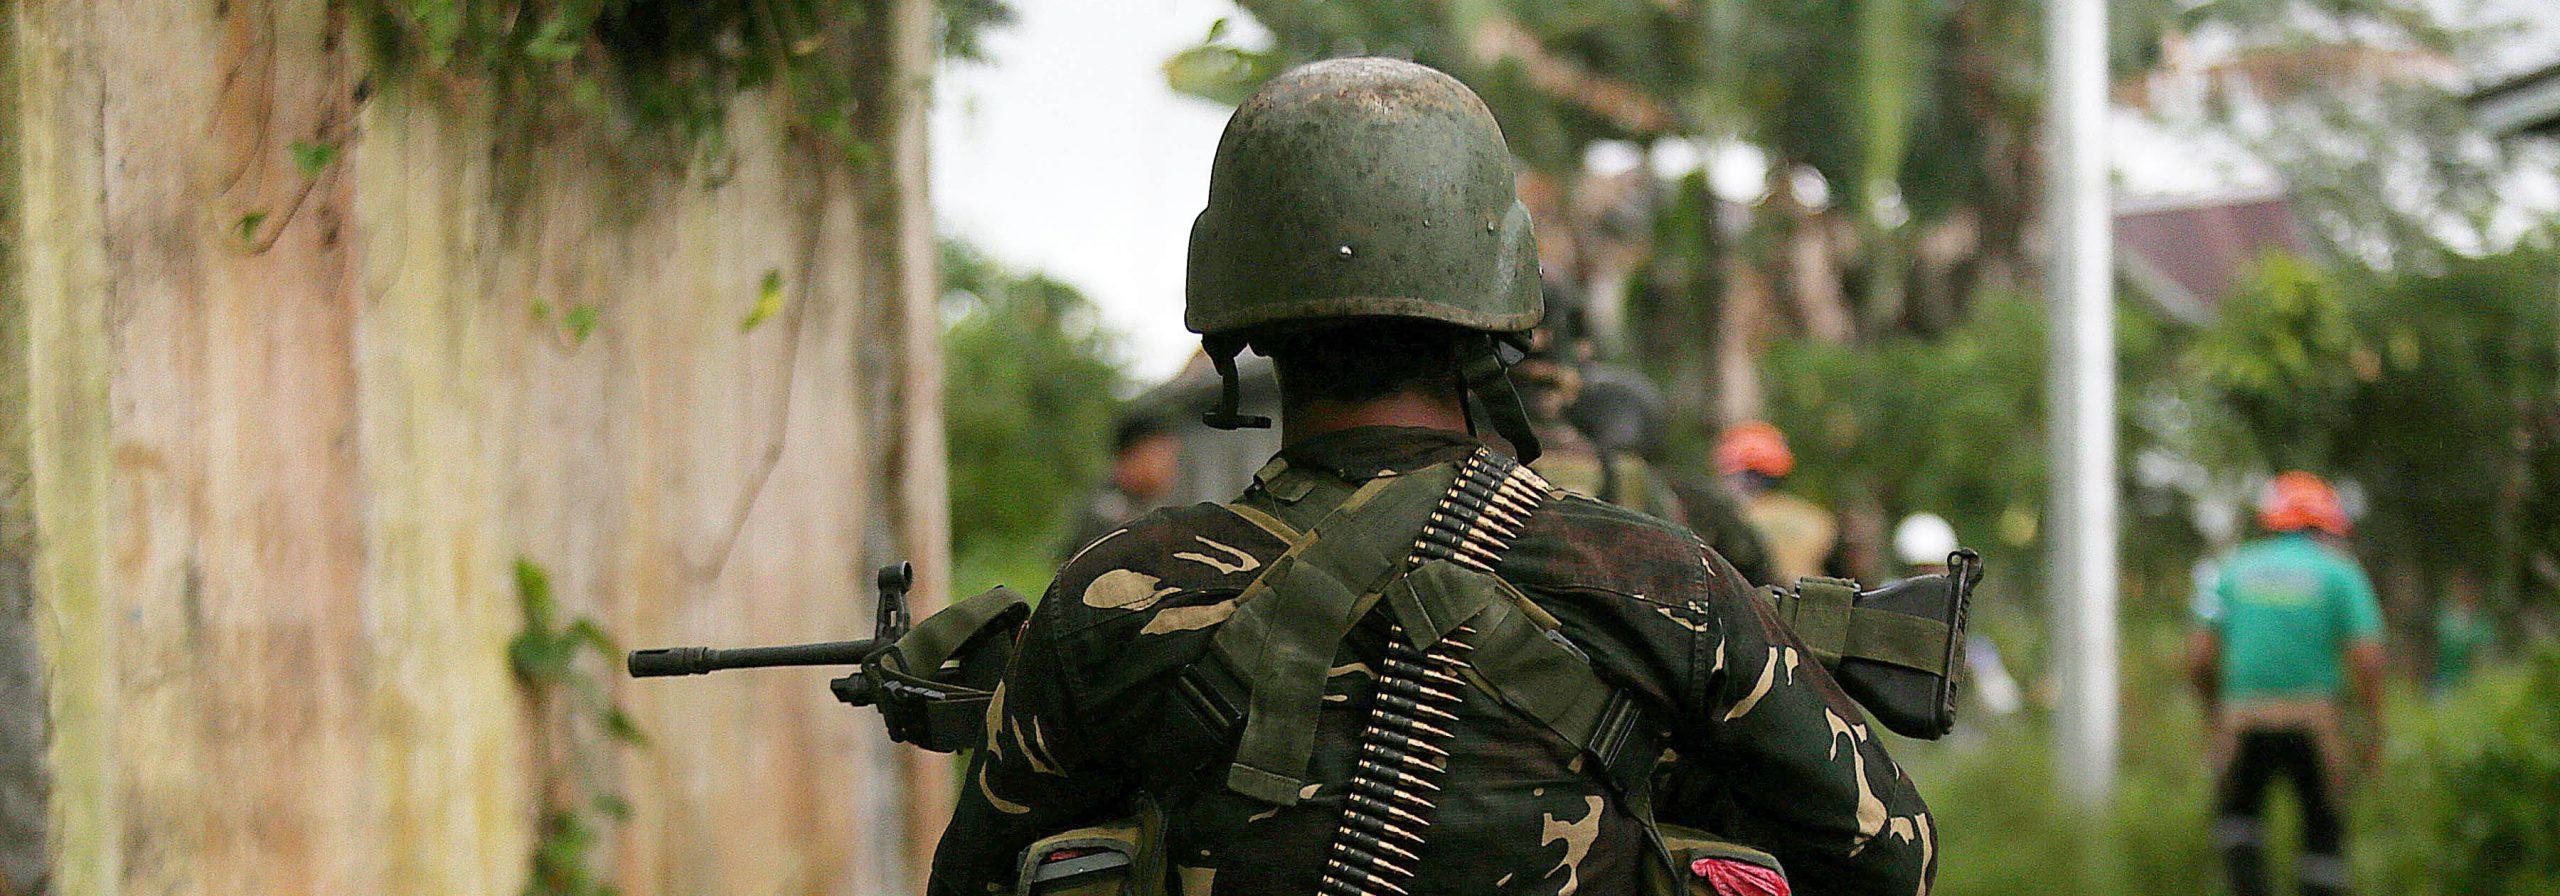 Esercito-filippino-a-Marawi-e1566111938493-2560x896.jpg